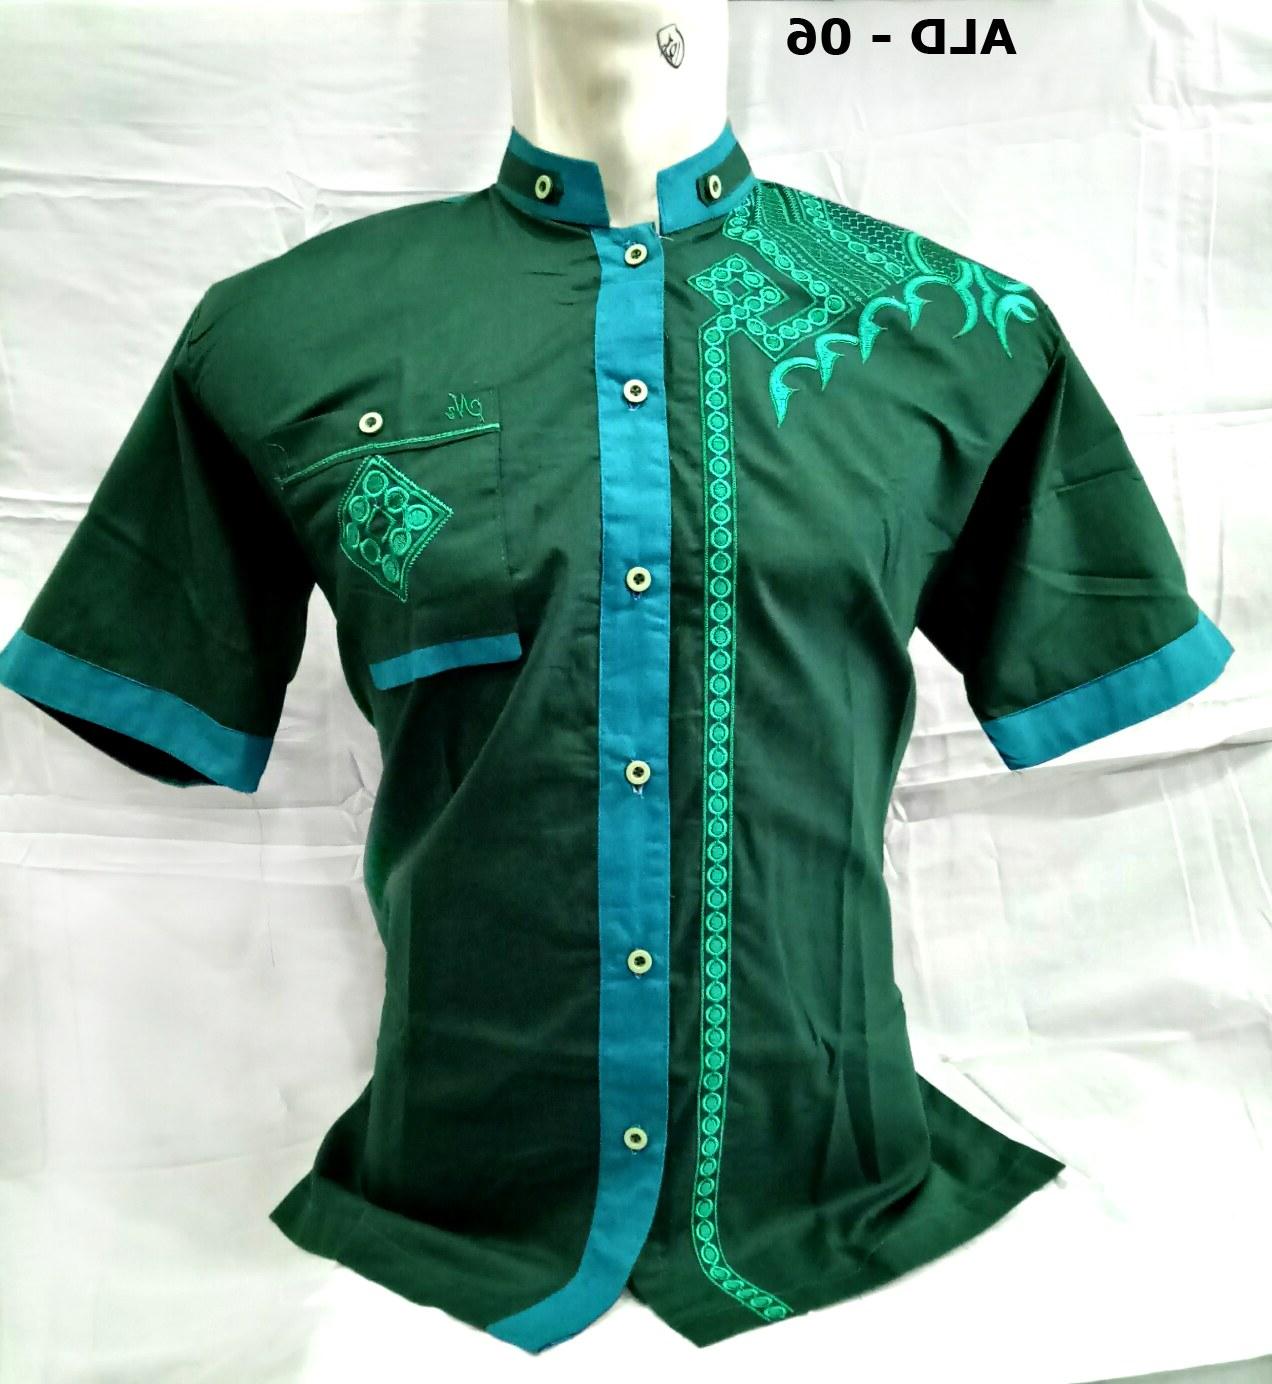 Bentuk Harga Baju Lebaran Thdr Model Baju Koko Lebaran 2018 Terbaru Dan Harganya Murah